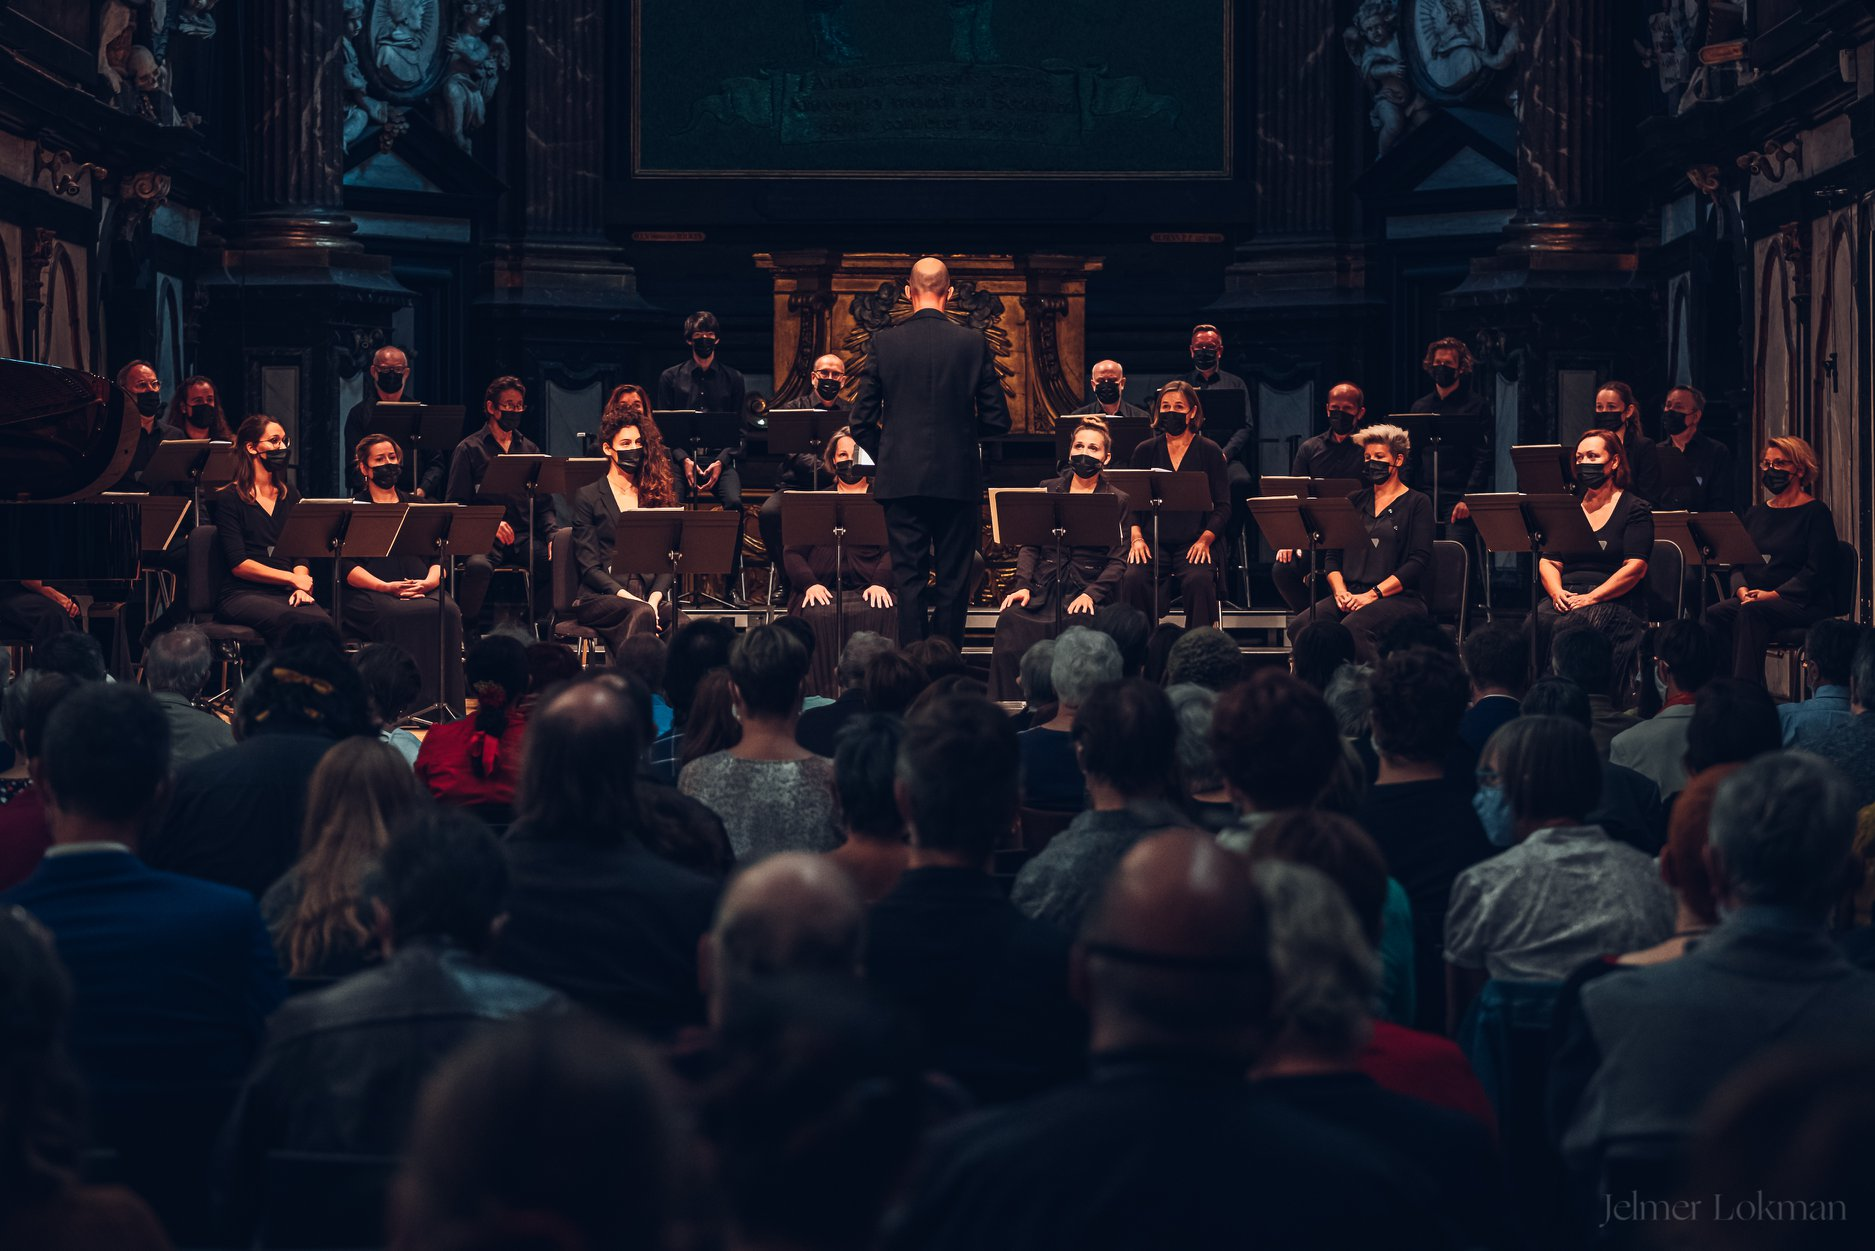 Vlaams Radiokoor o.l.v. Bart Van Reyn - Johannes Brahms - 11u